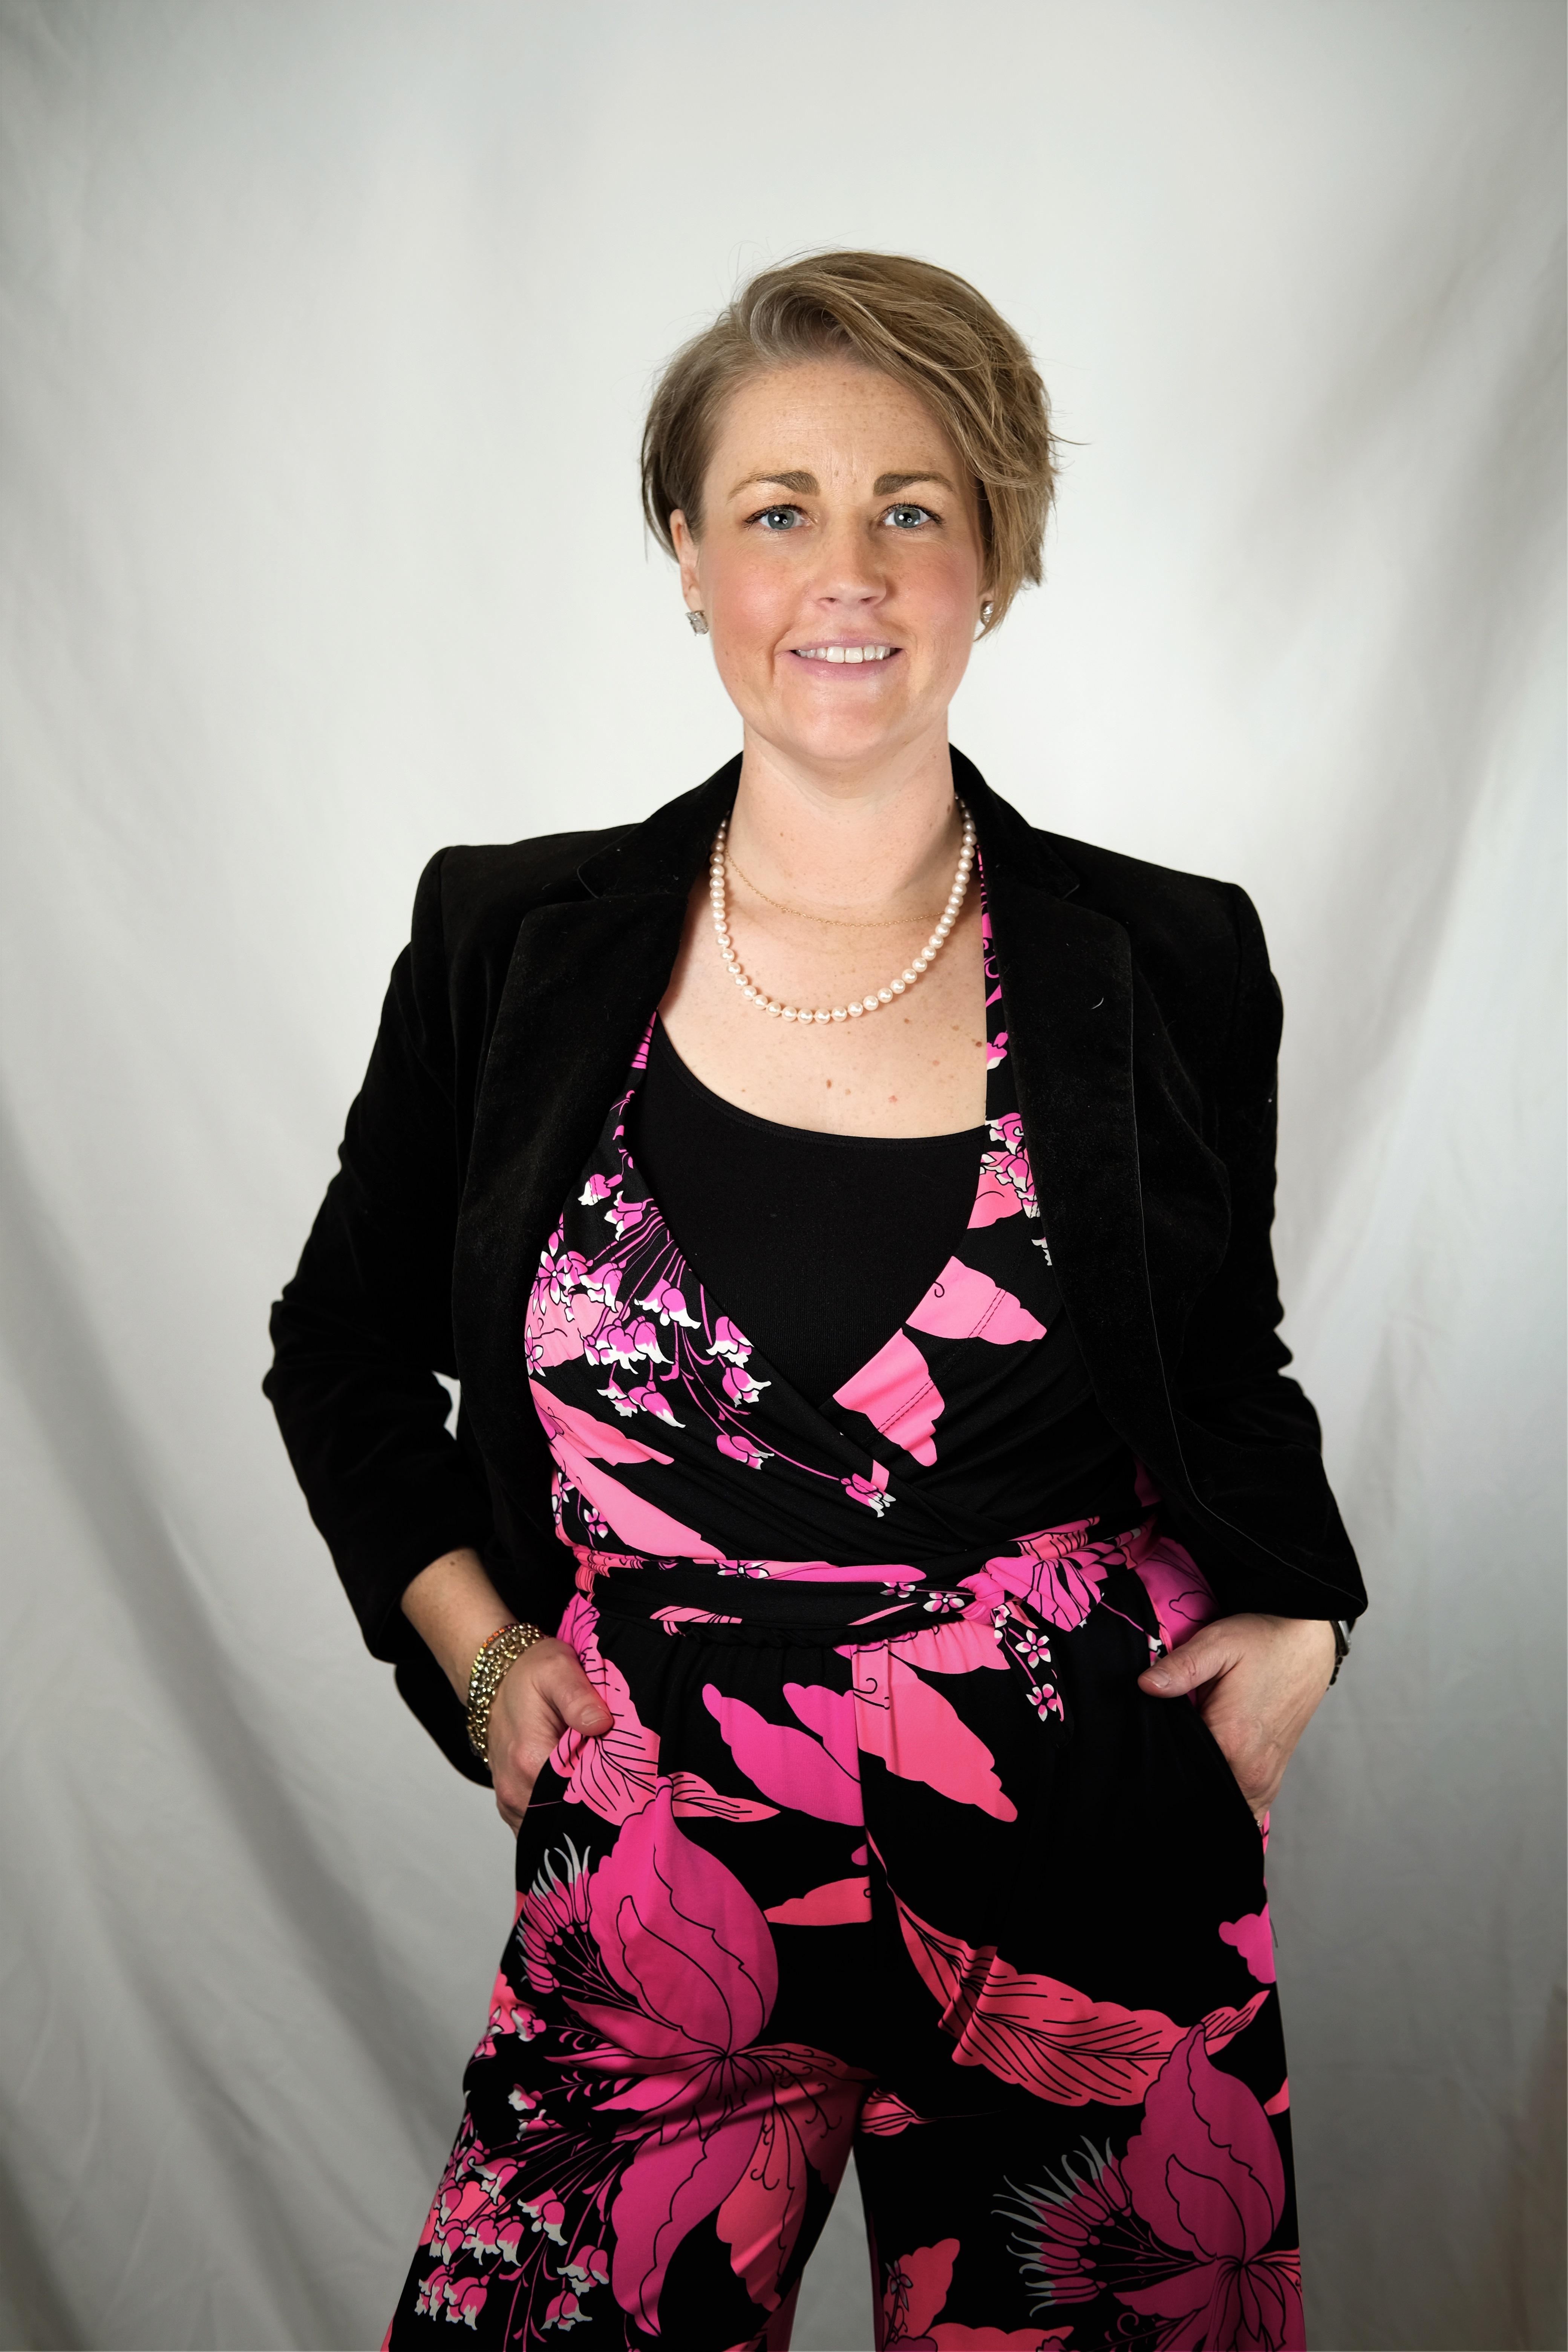 Elizabeth Hockmeyer-Williams